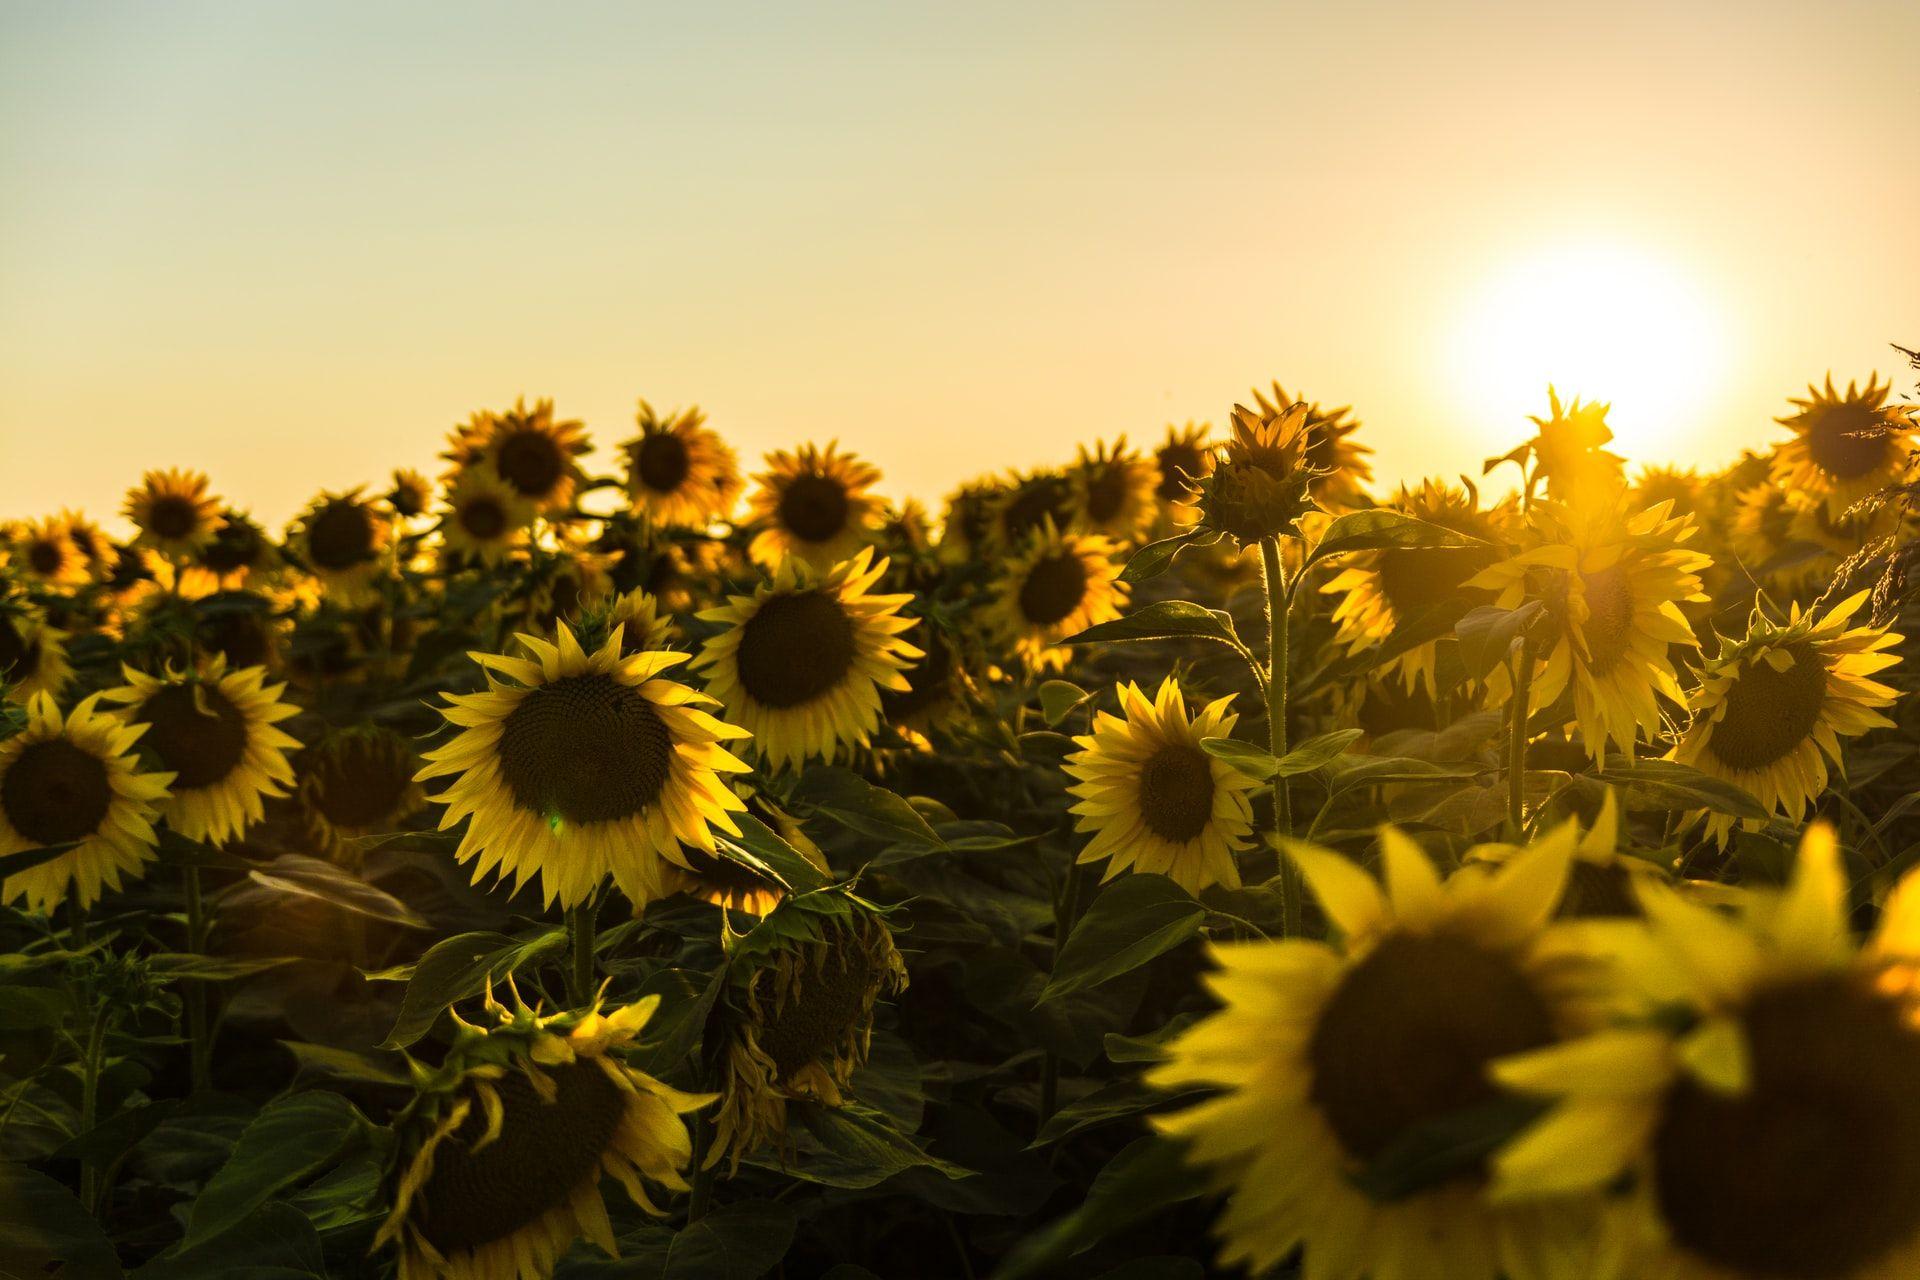 sunny weather sunflowers and sun